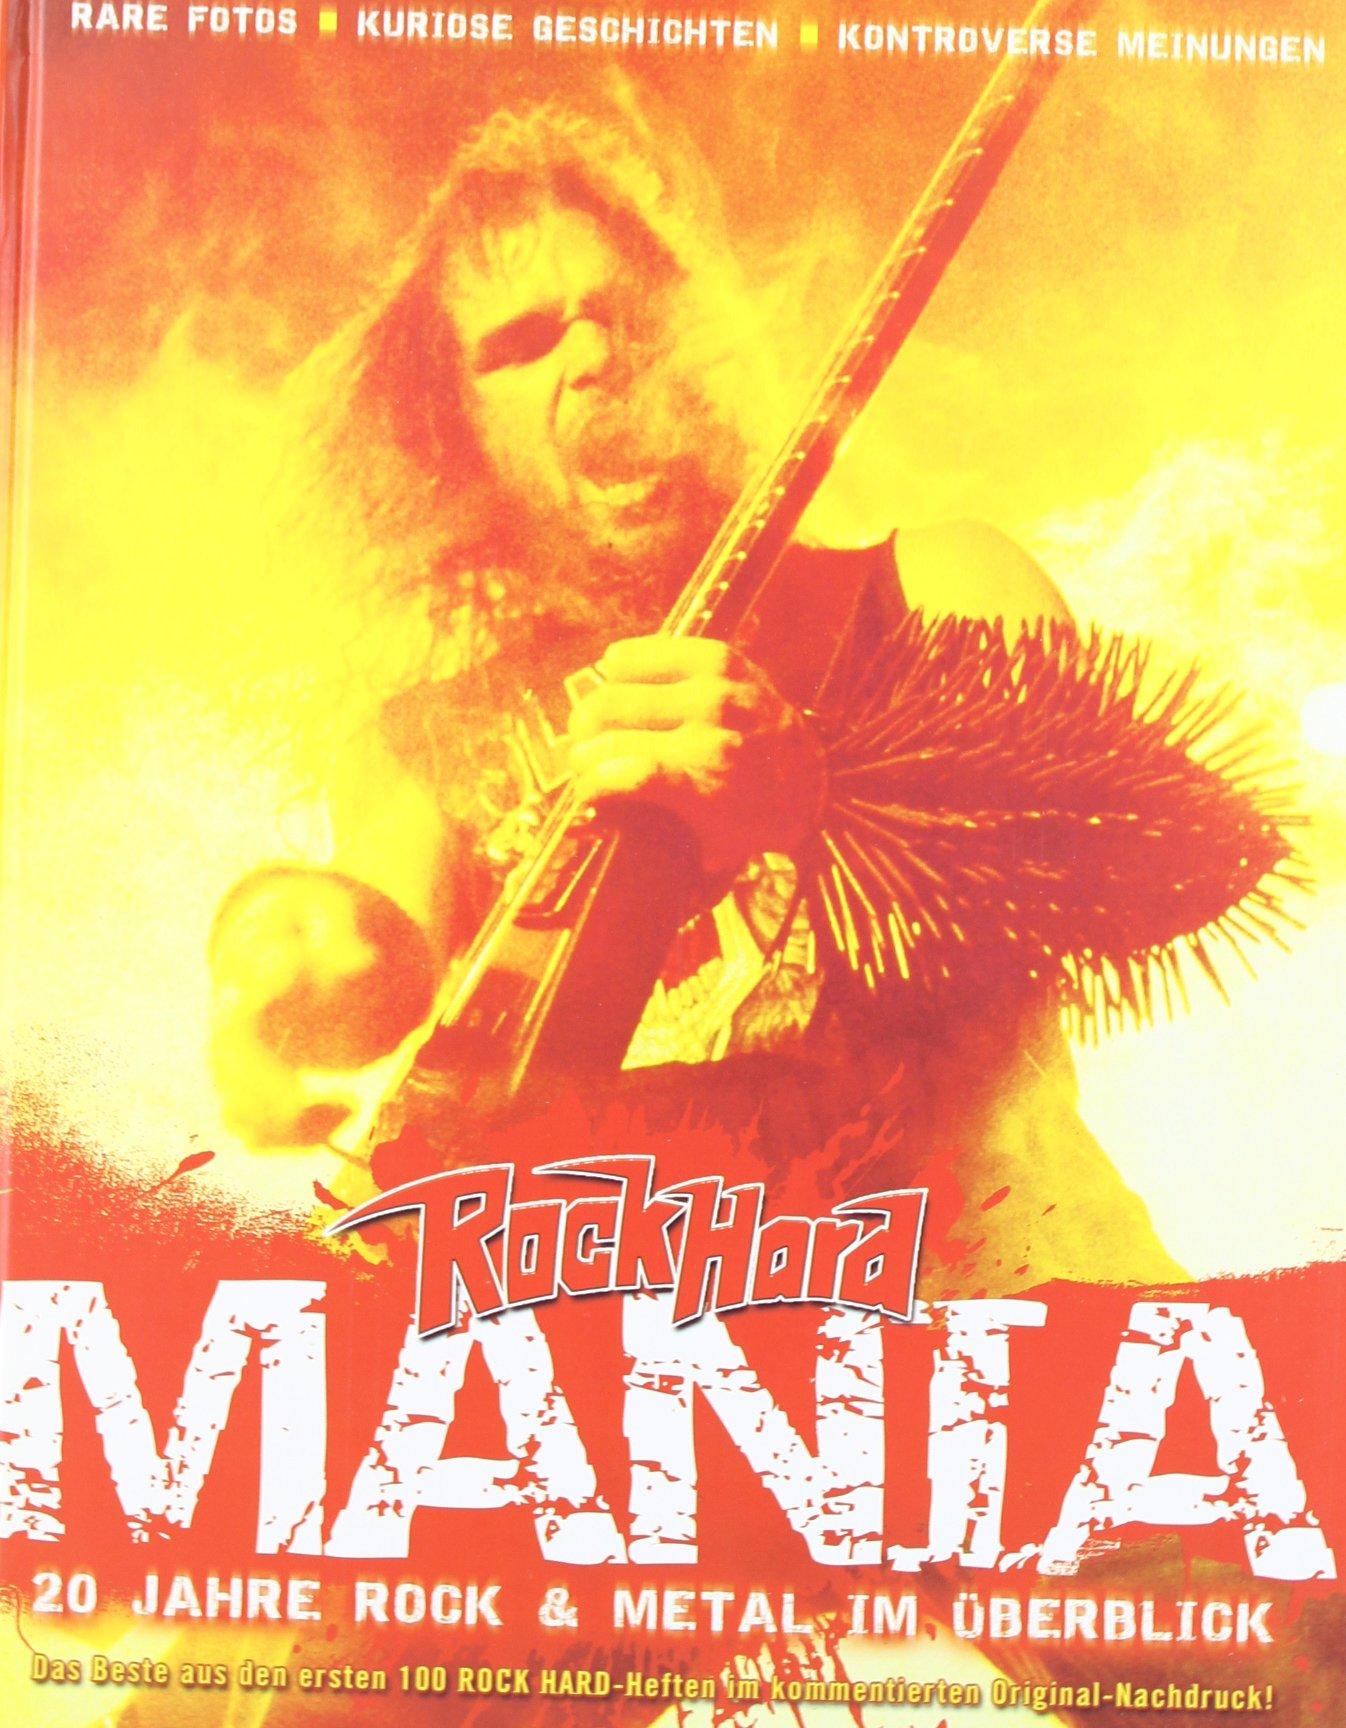 Rock Hard Mania: 20 Jahre Rock & Metal im Überblick